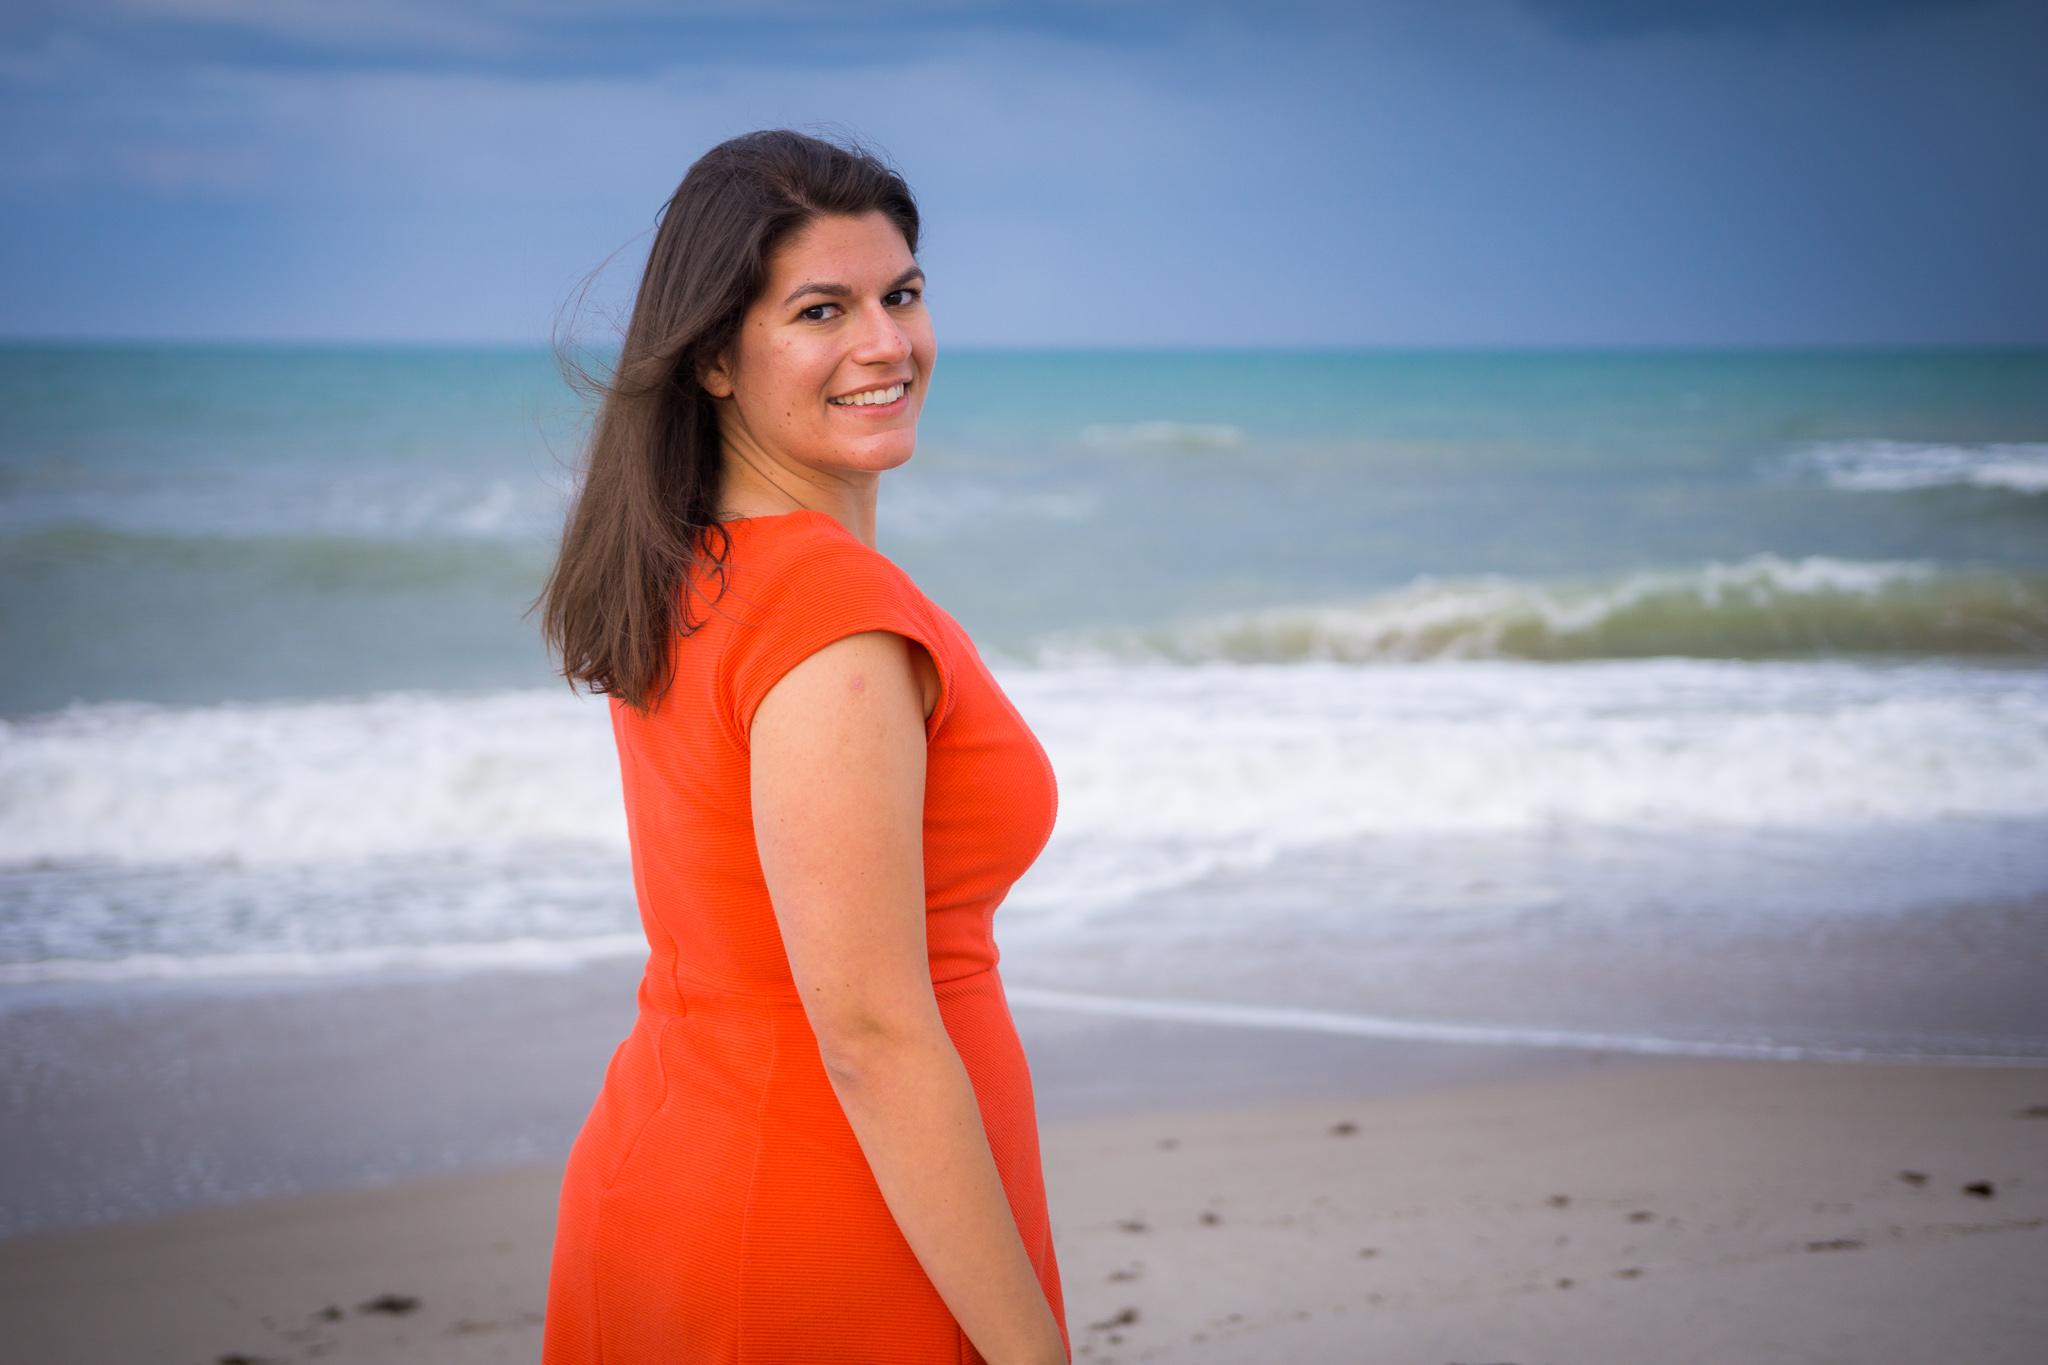 Mariana Flores The Catholic Woman Portrait